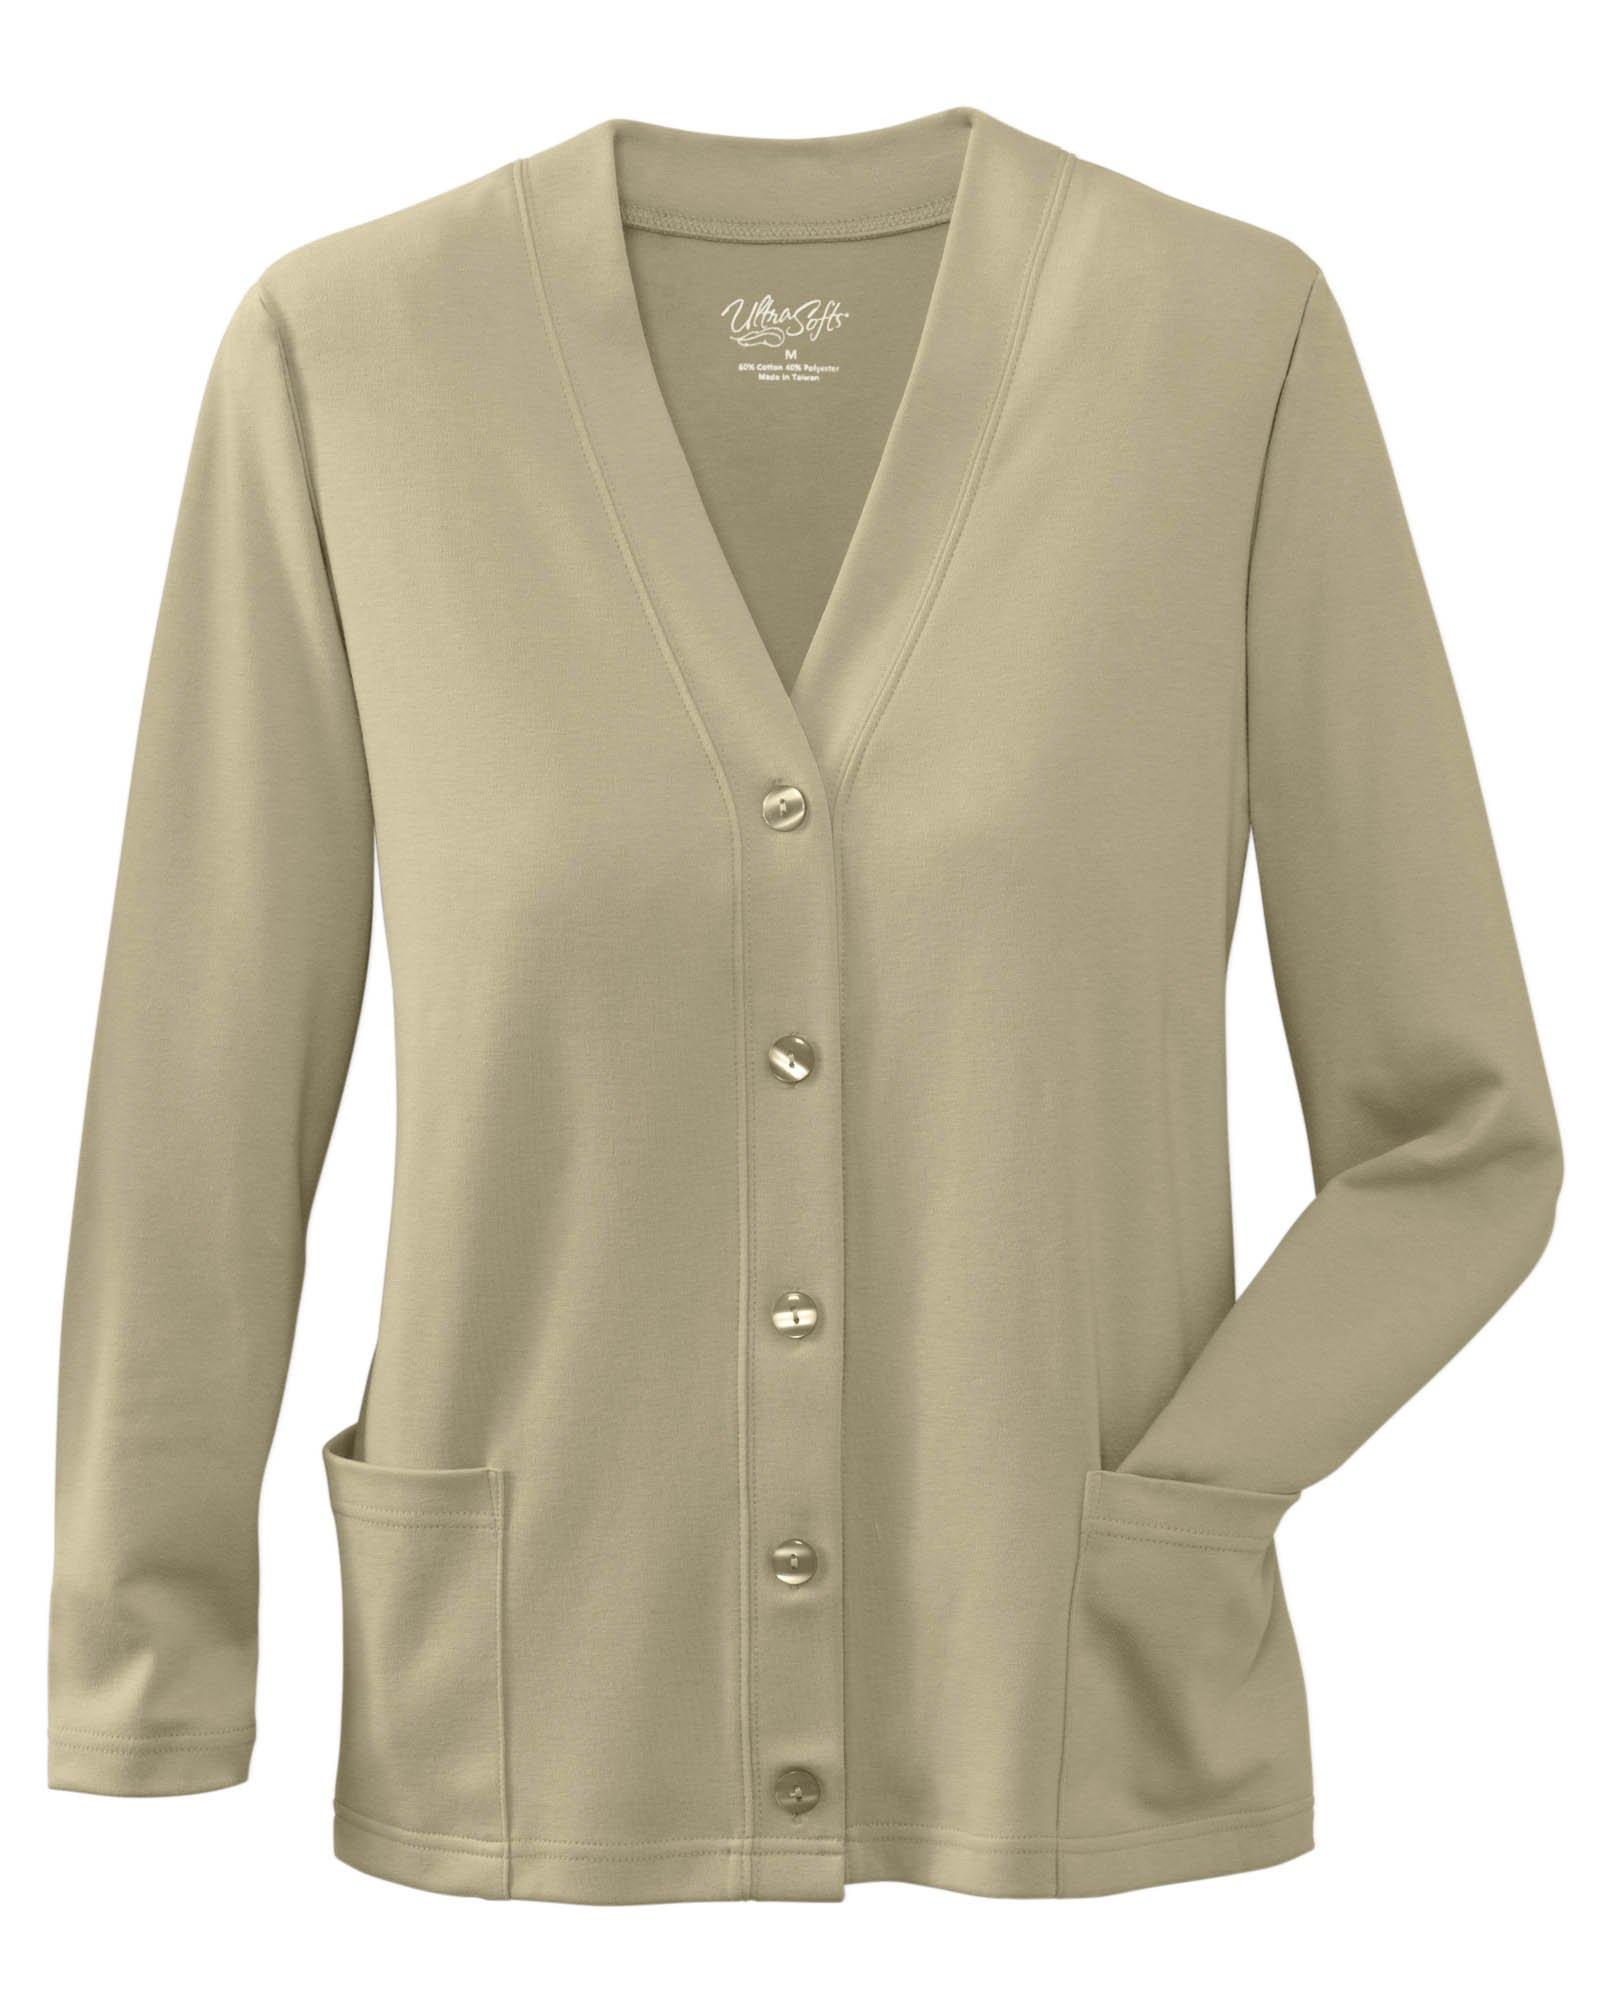 UltraSofts Button-Front Knit Cardigan, Deep Sand, Medium